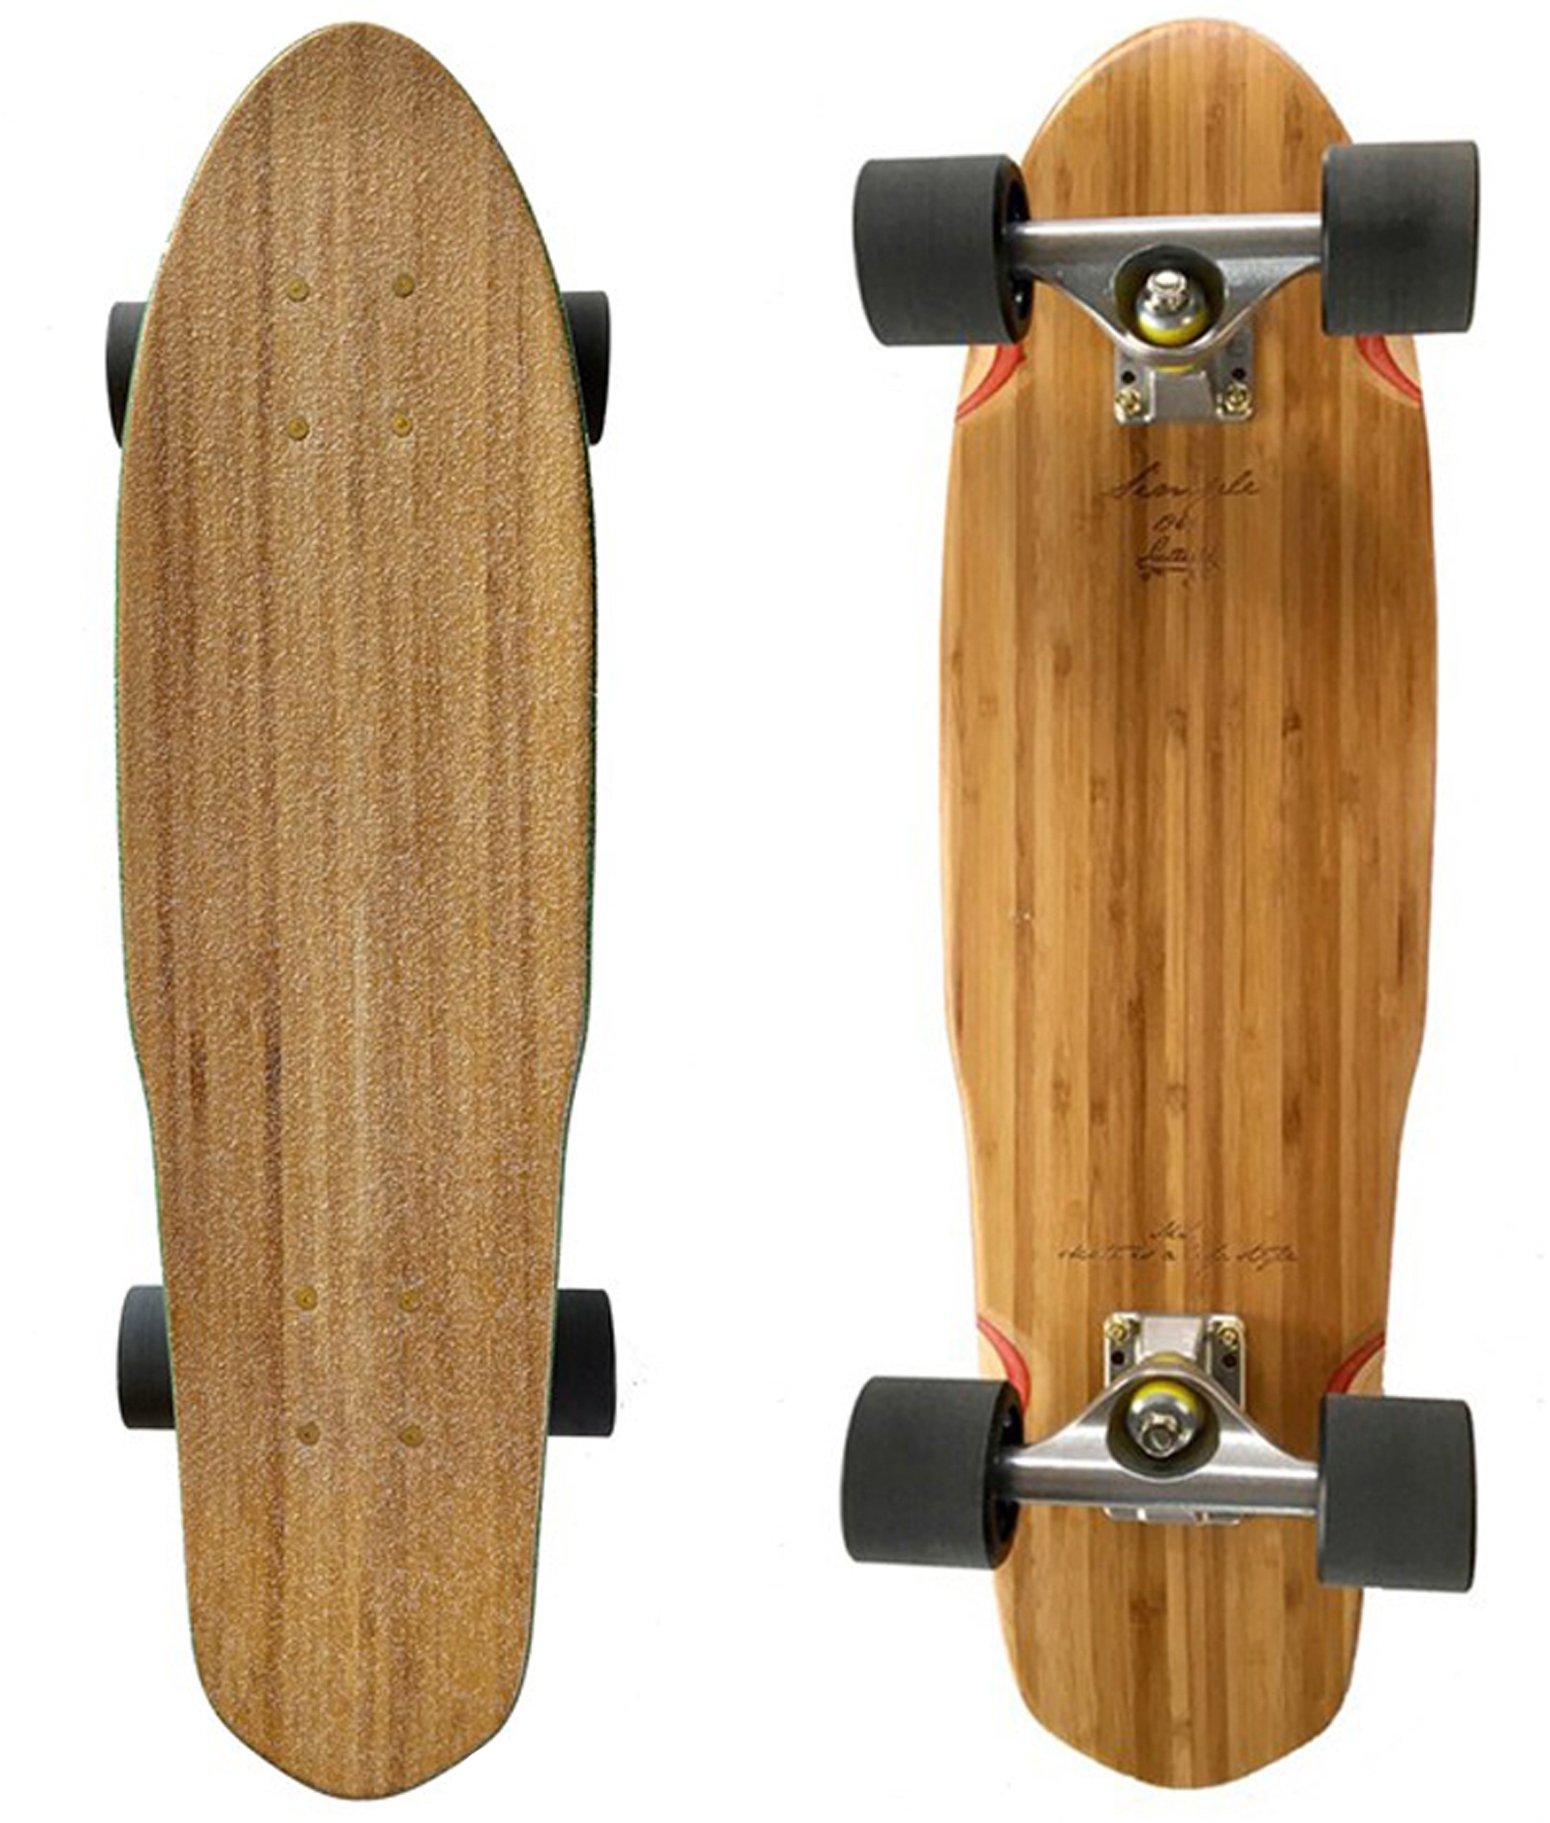 LMAI 27'' Bamboo Wood Cruiser Complete Skateboard (Clear Grip) by Lmai Skateboards